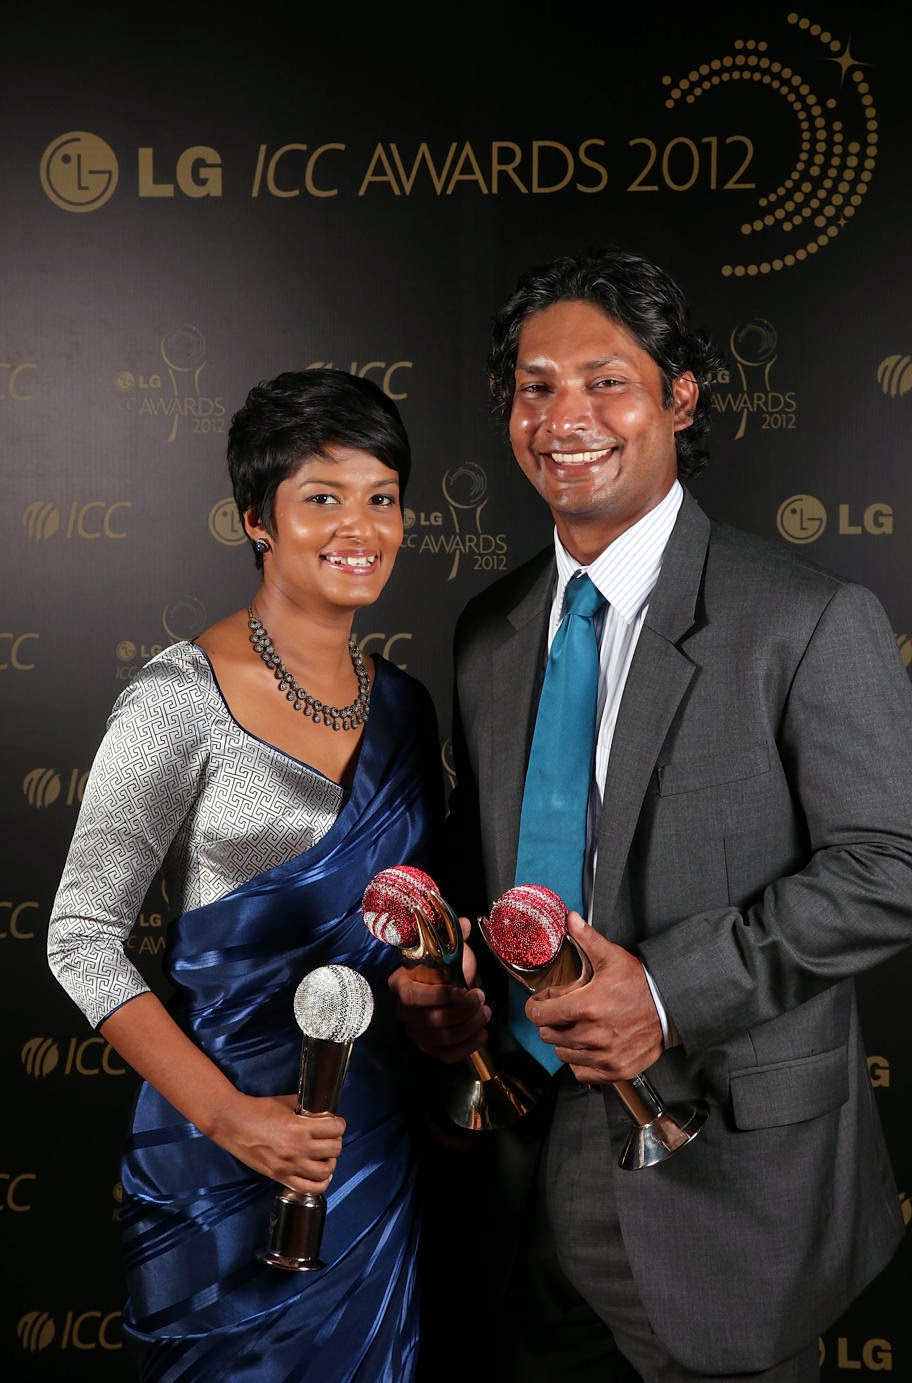 Sri Lankan Cricketer Kumar Sangakkara Family Photos Mere Pix